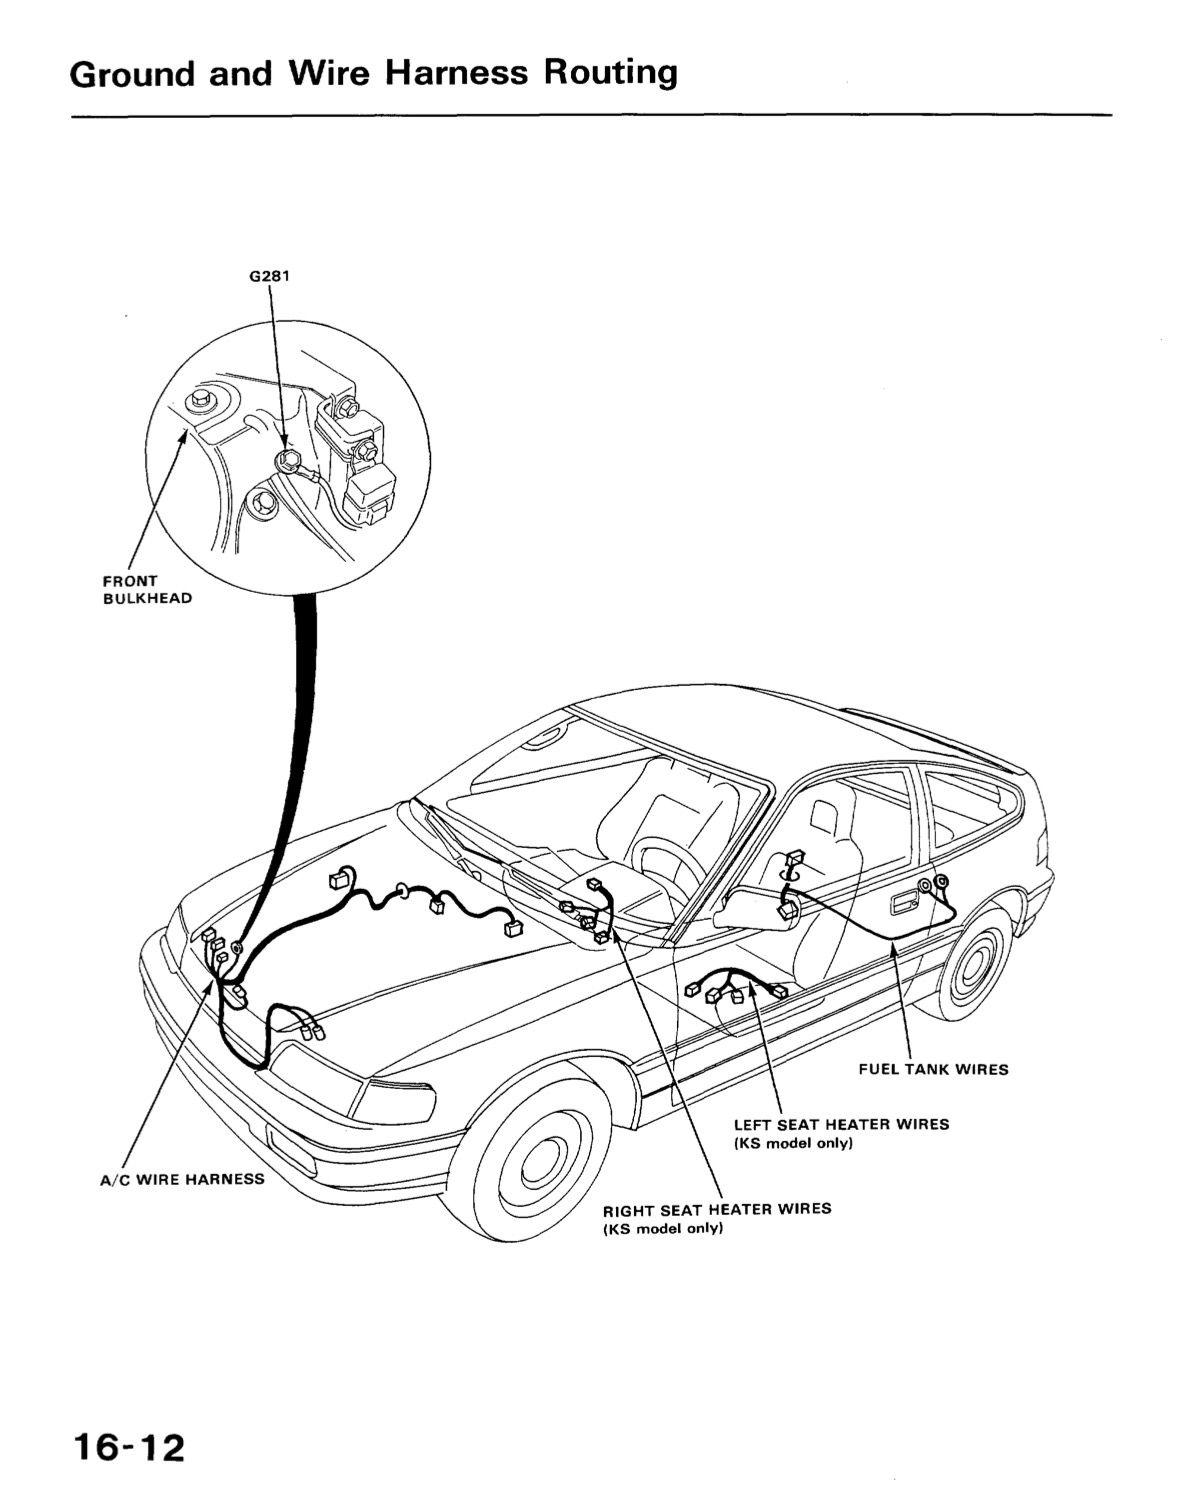 Ground wire harness diagram media honda co